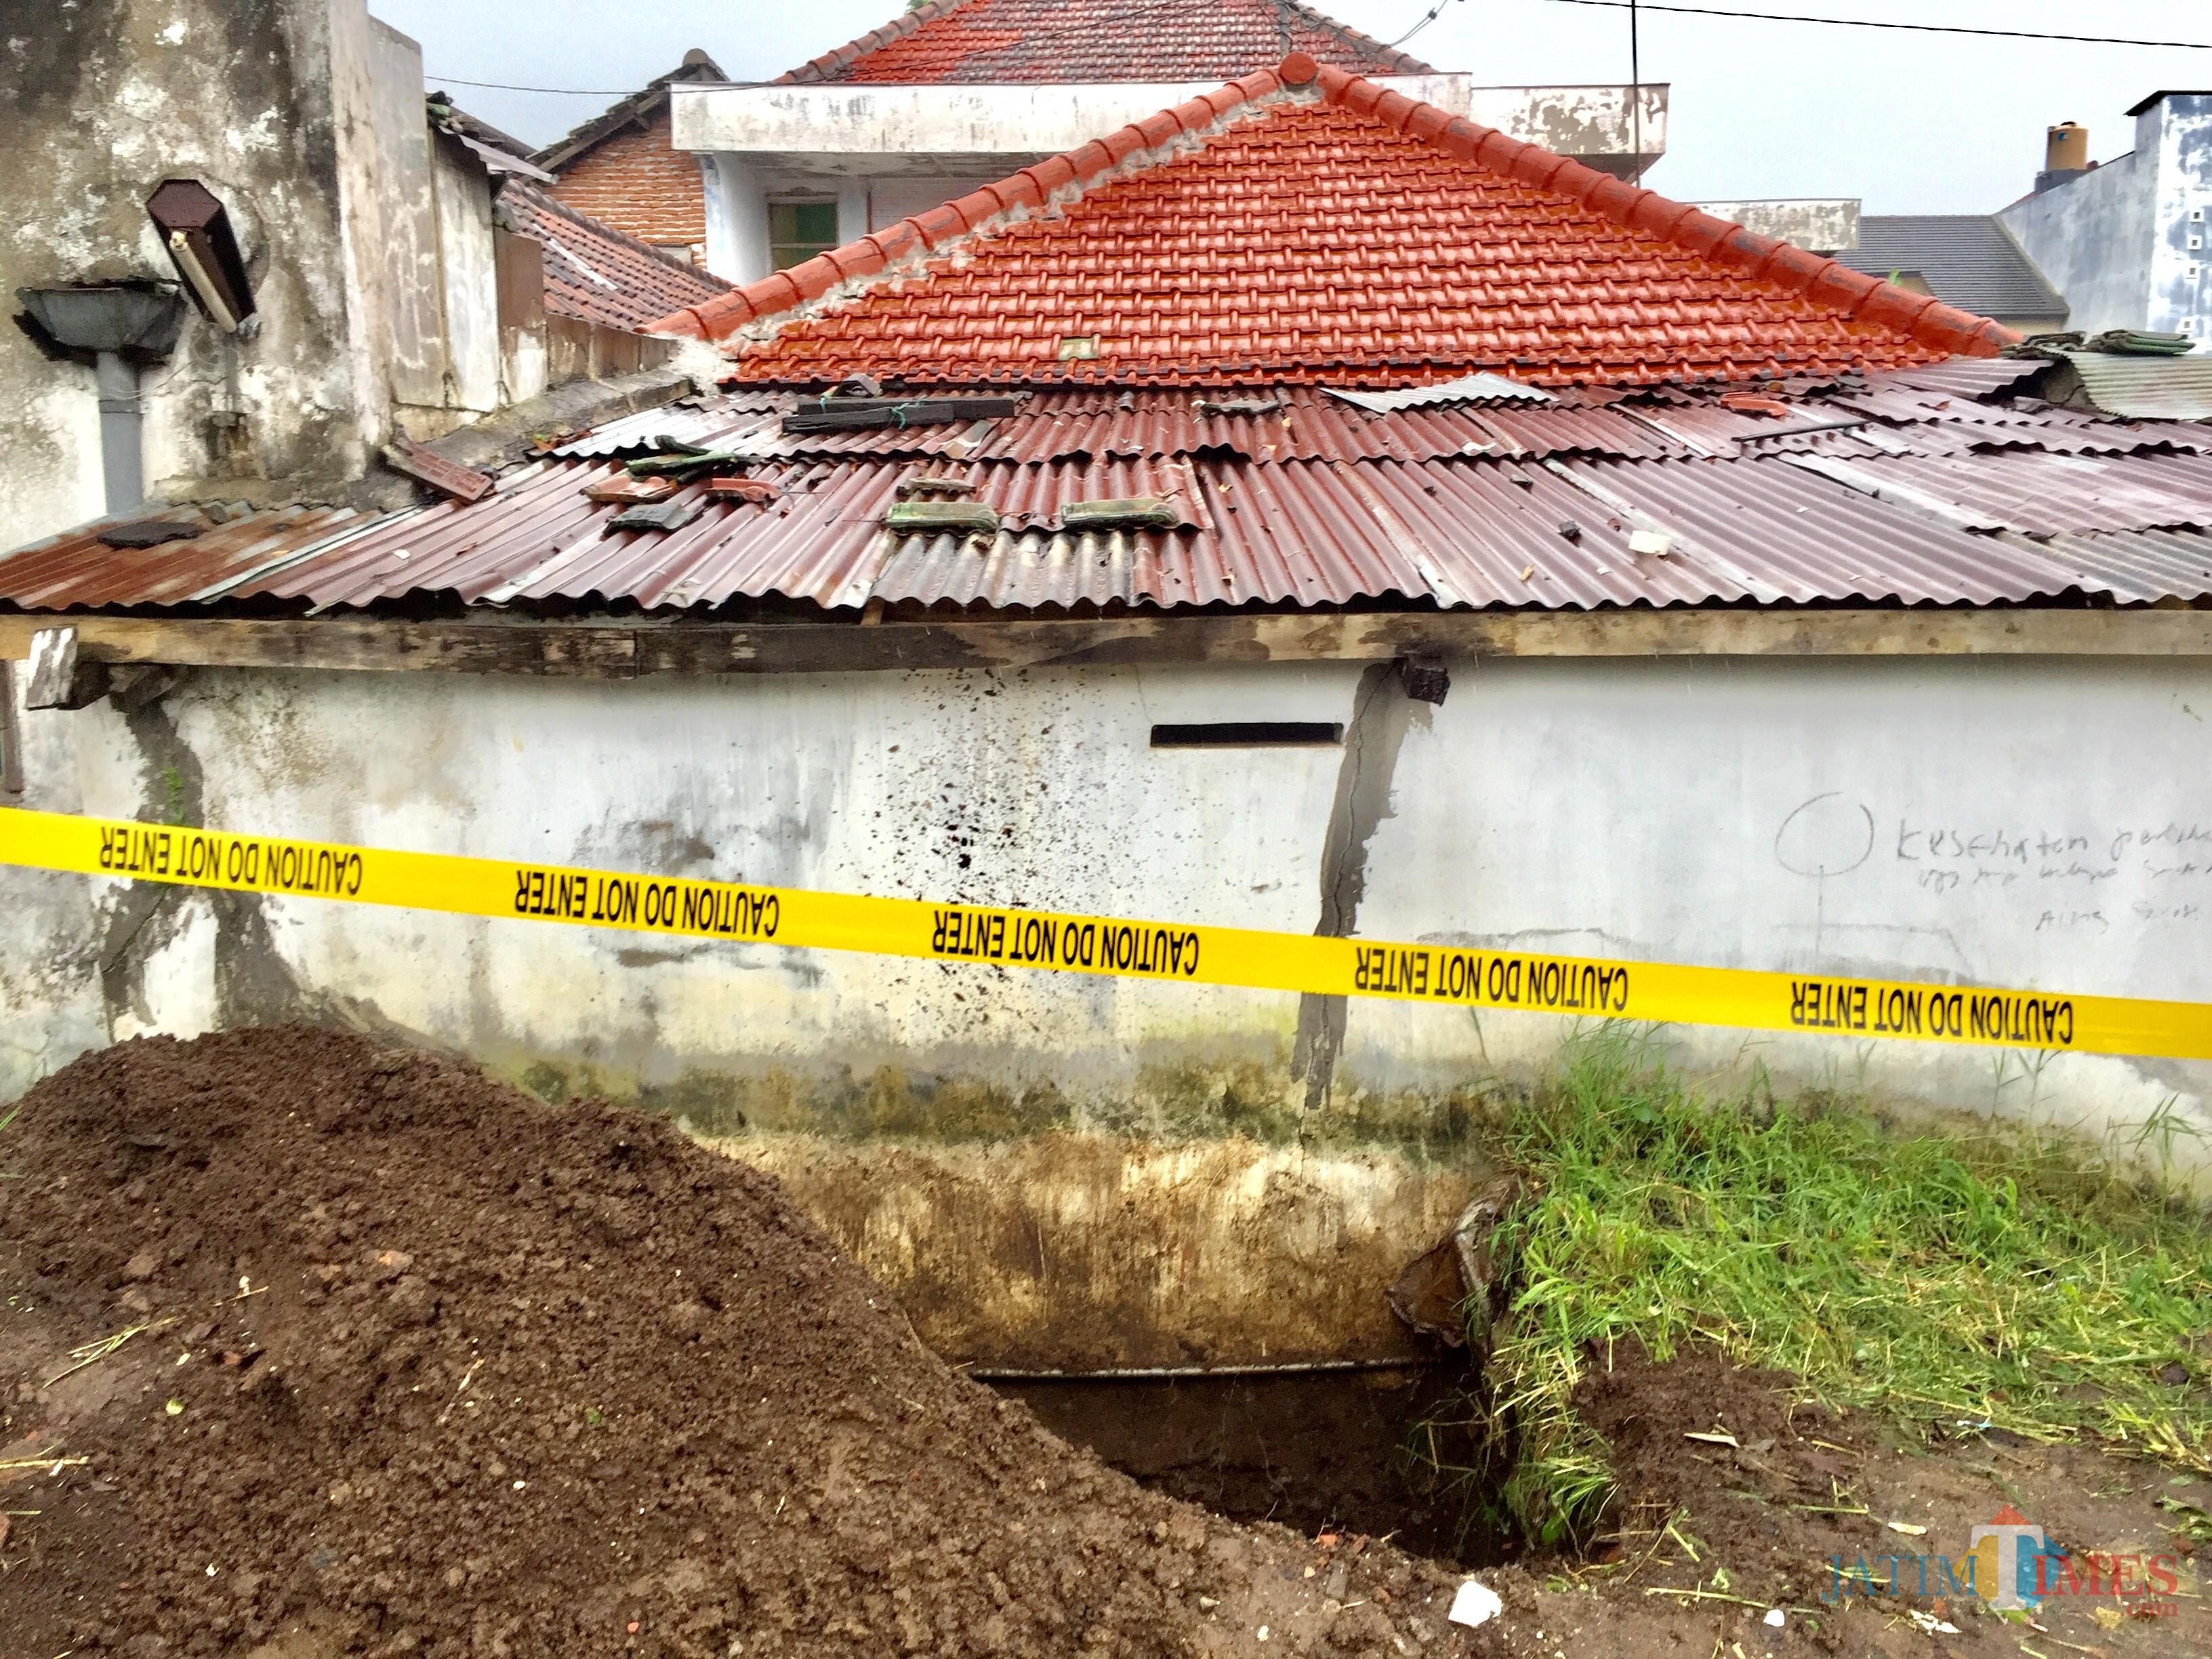 Kondisi rumahKasdi wargaJalan M. Sahar RT 03 RW 03 Kelurahan Sisir, Kecamatan Batu, Kota Batu,Kamis (17/1/2019). (Foto: Irsya Richa/MalangTIMES)